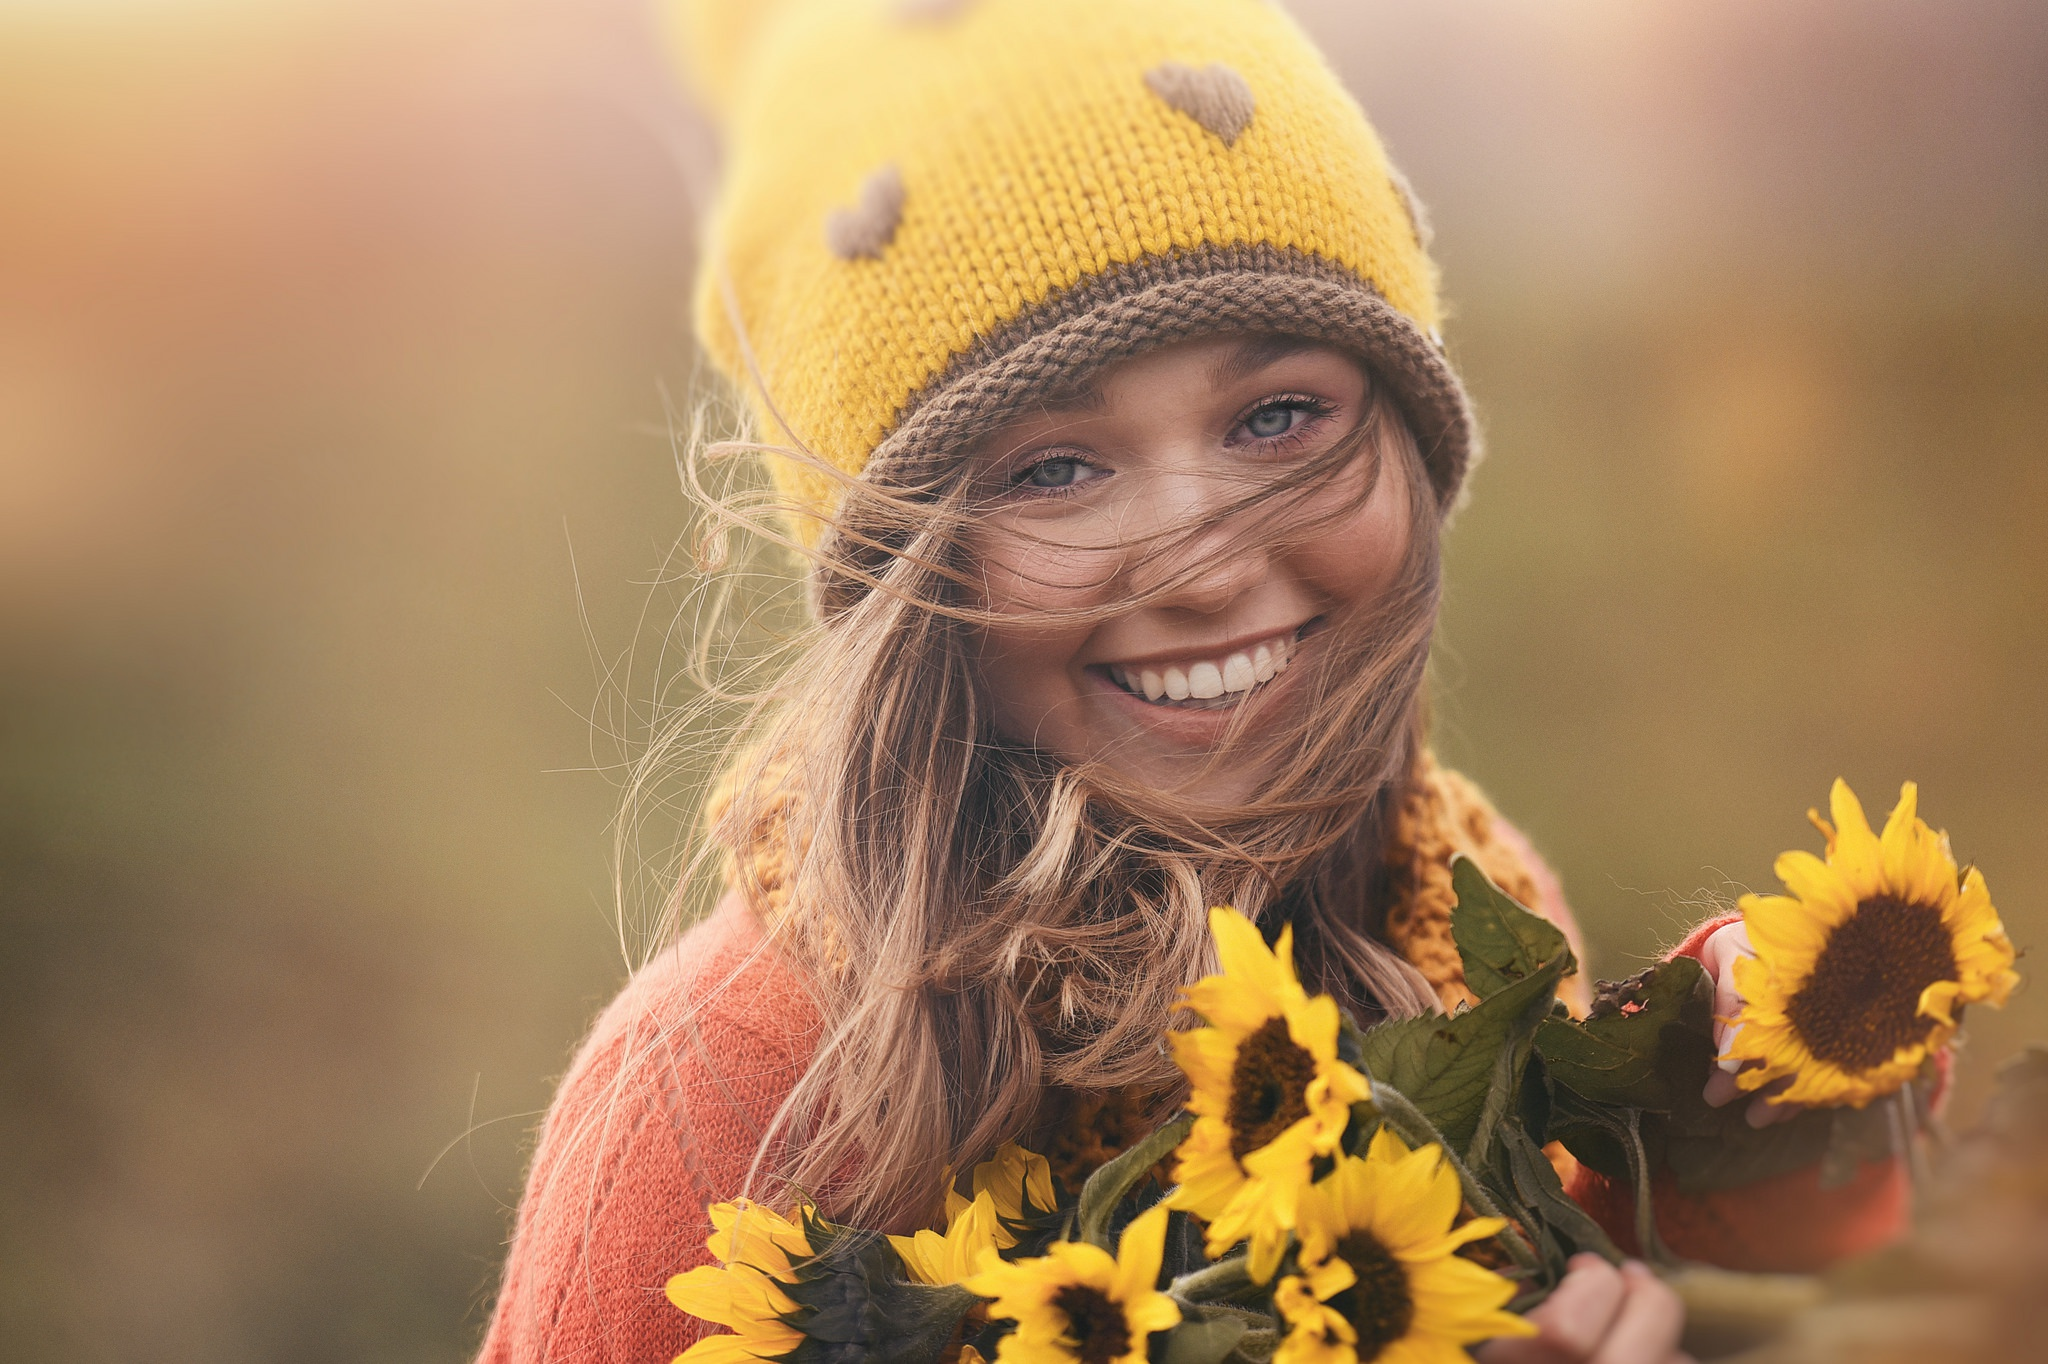 Картинки радости жизни девушки